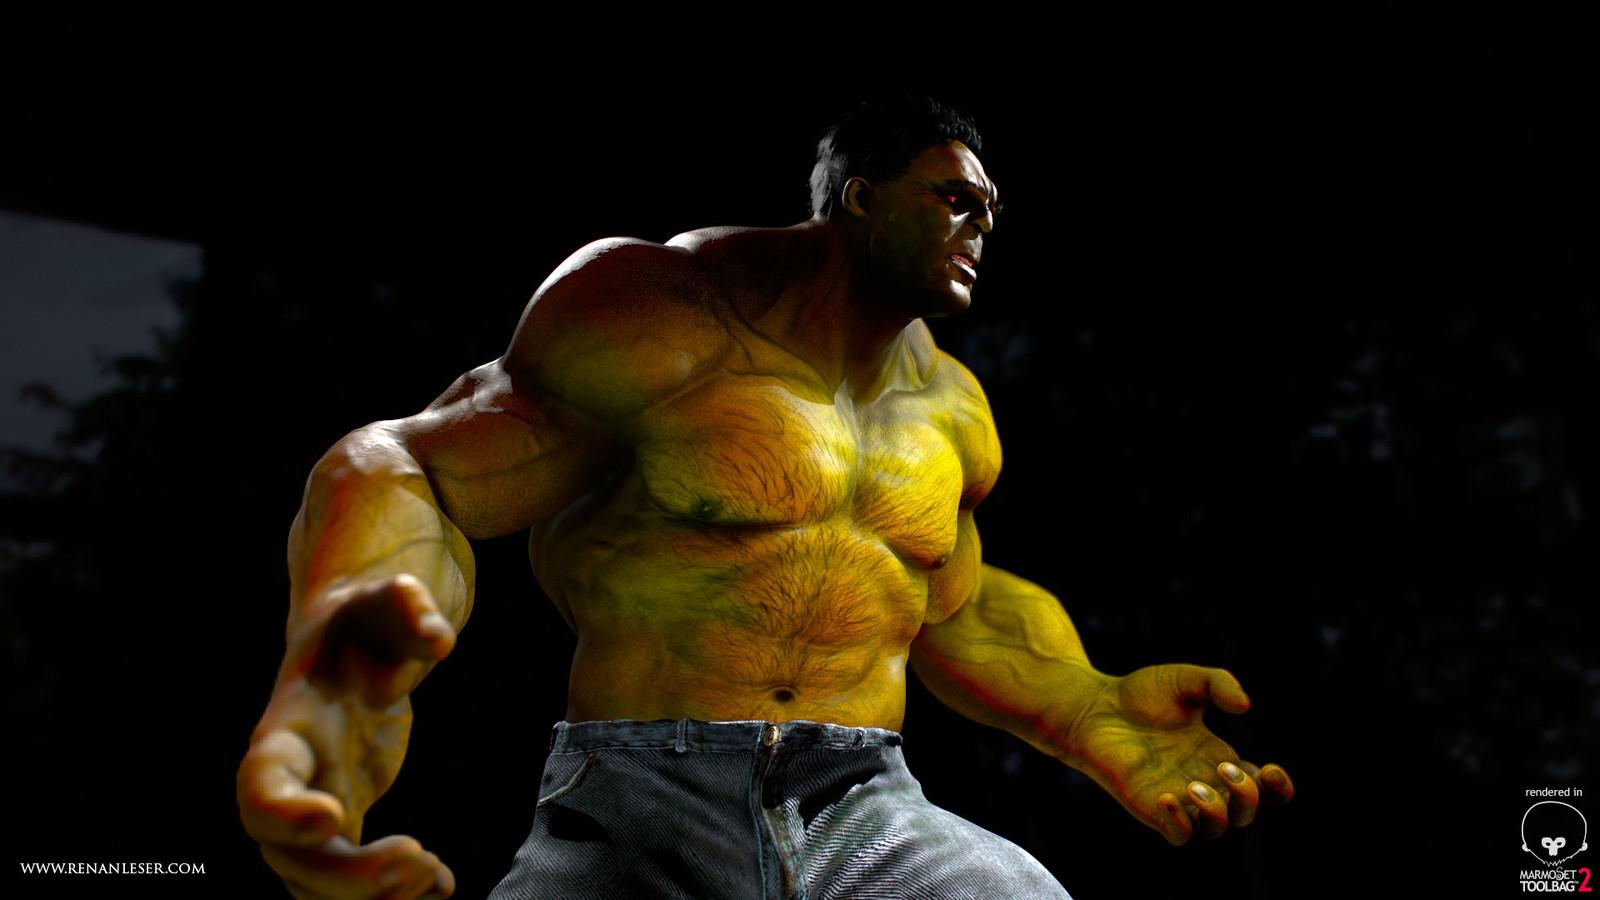 Hulk ZBrush